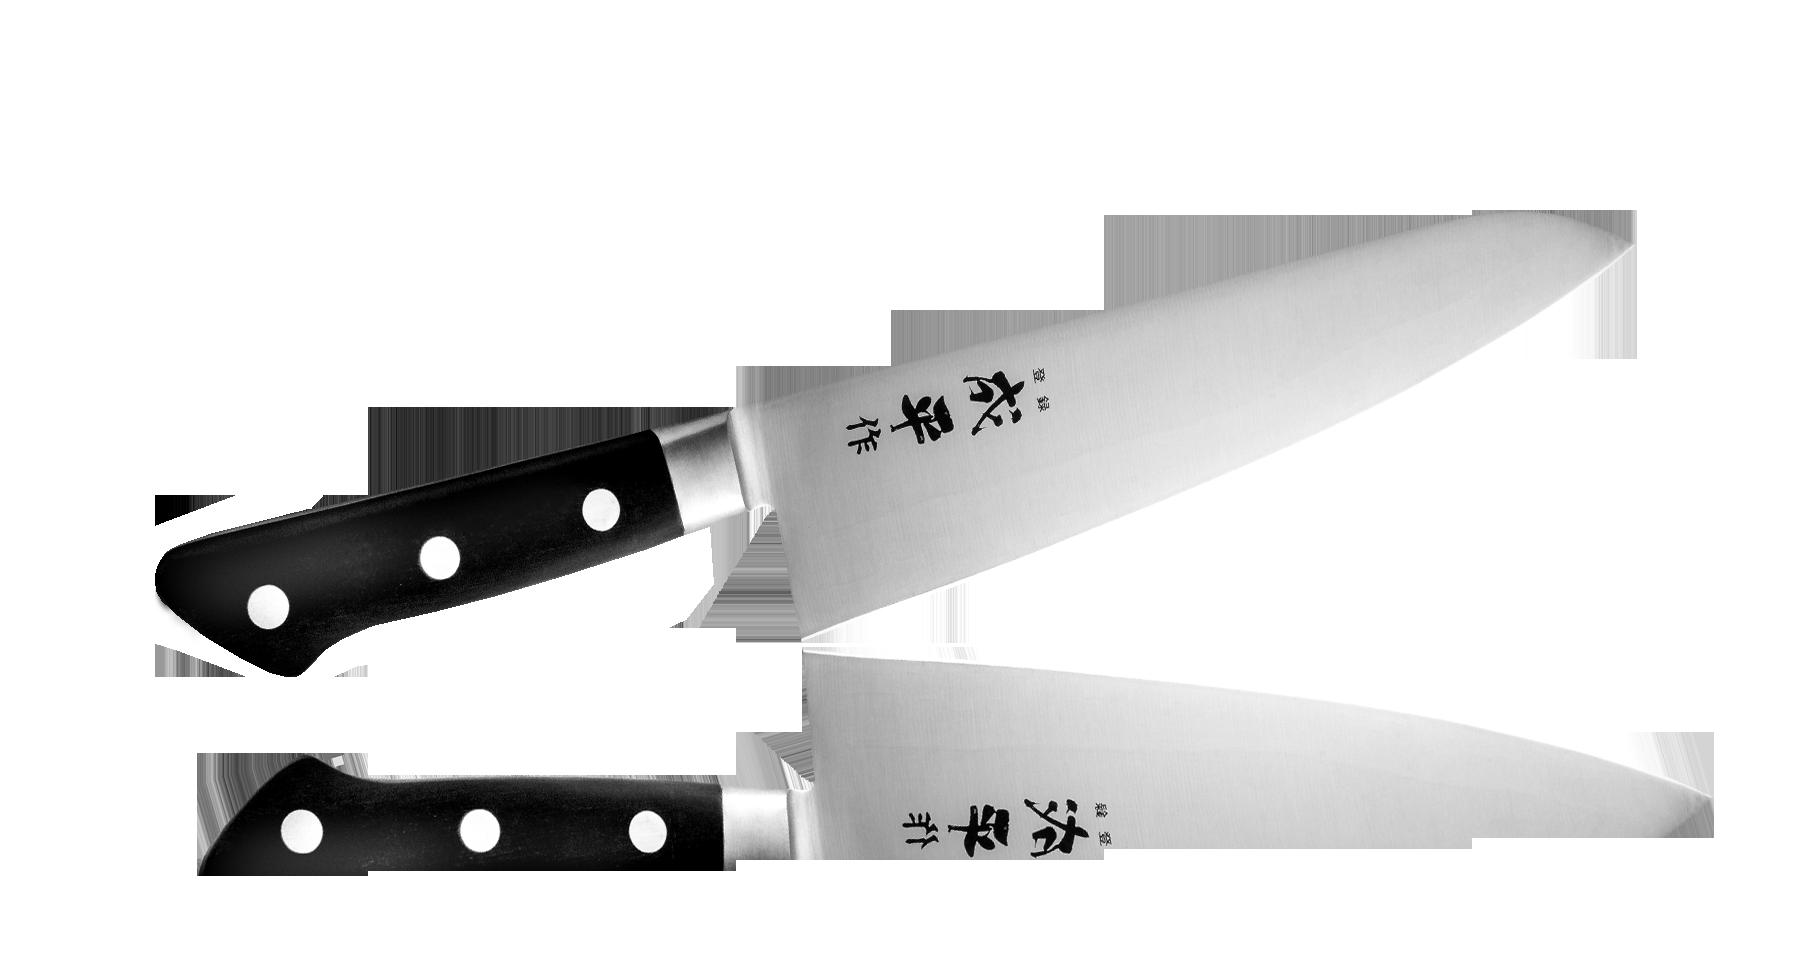 Нож Шефа Narihira 240 мм, сталь AUS-8 Tojiro